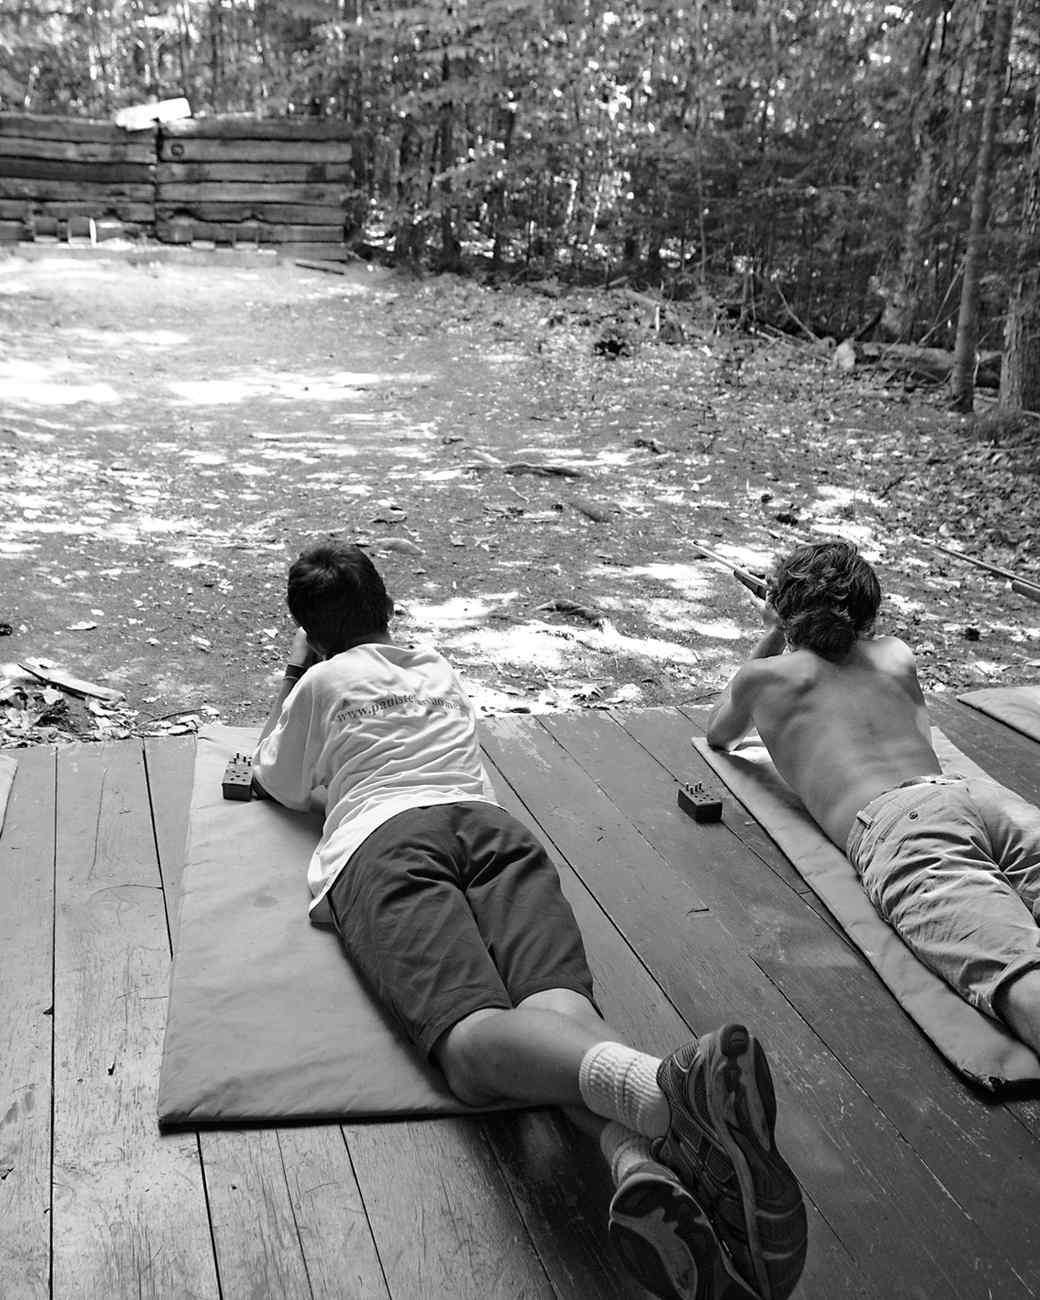 pine-island-summer-camp-ms108559-440.jpg